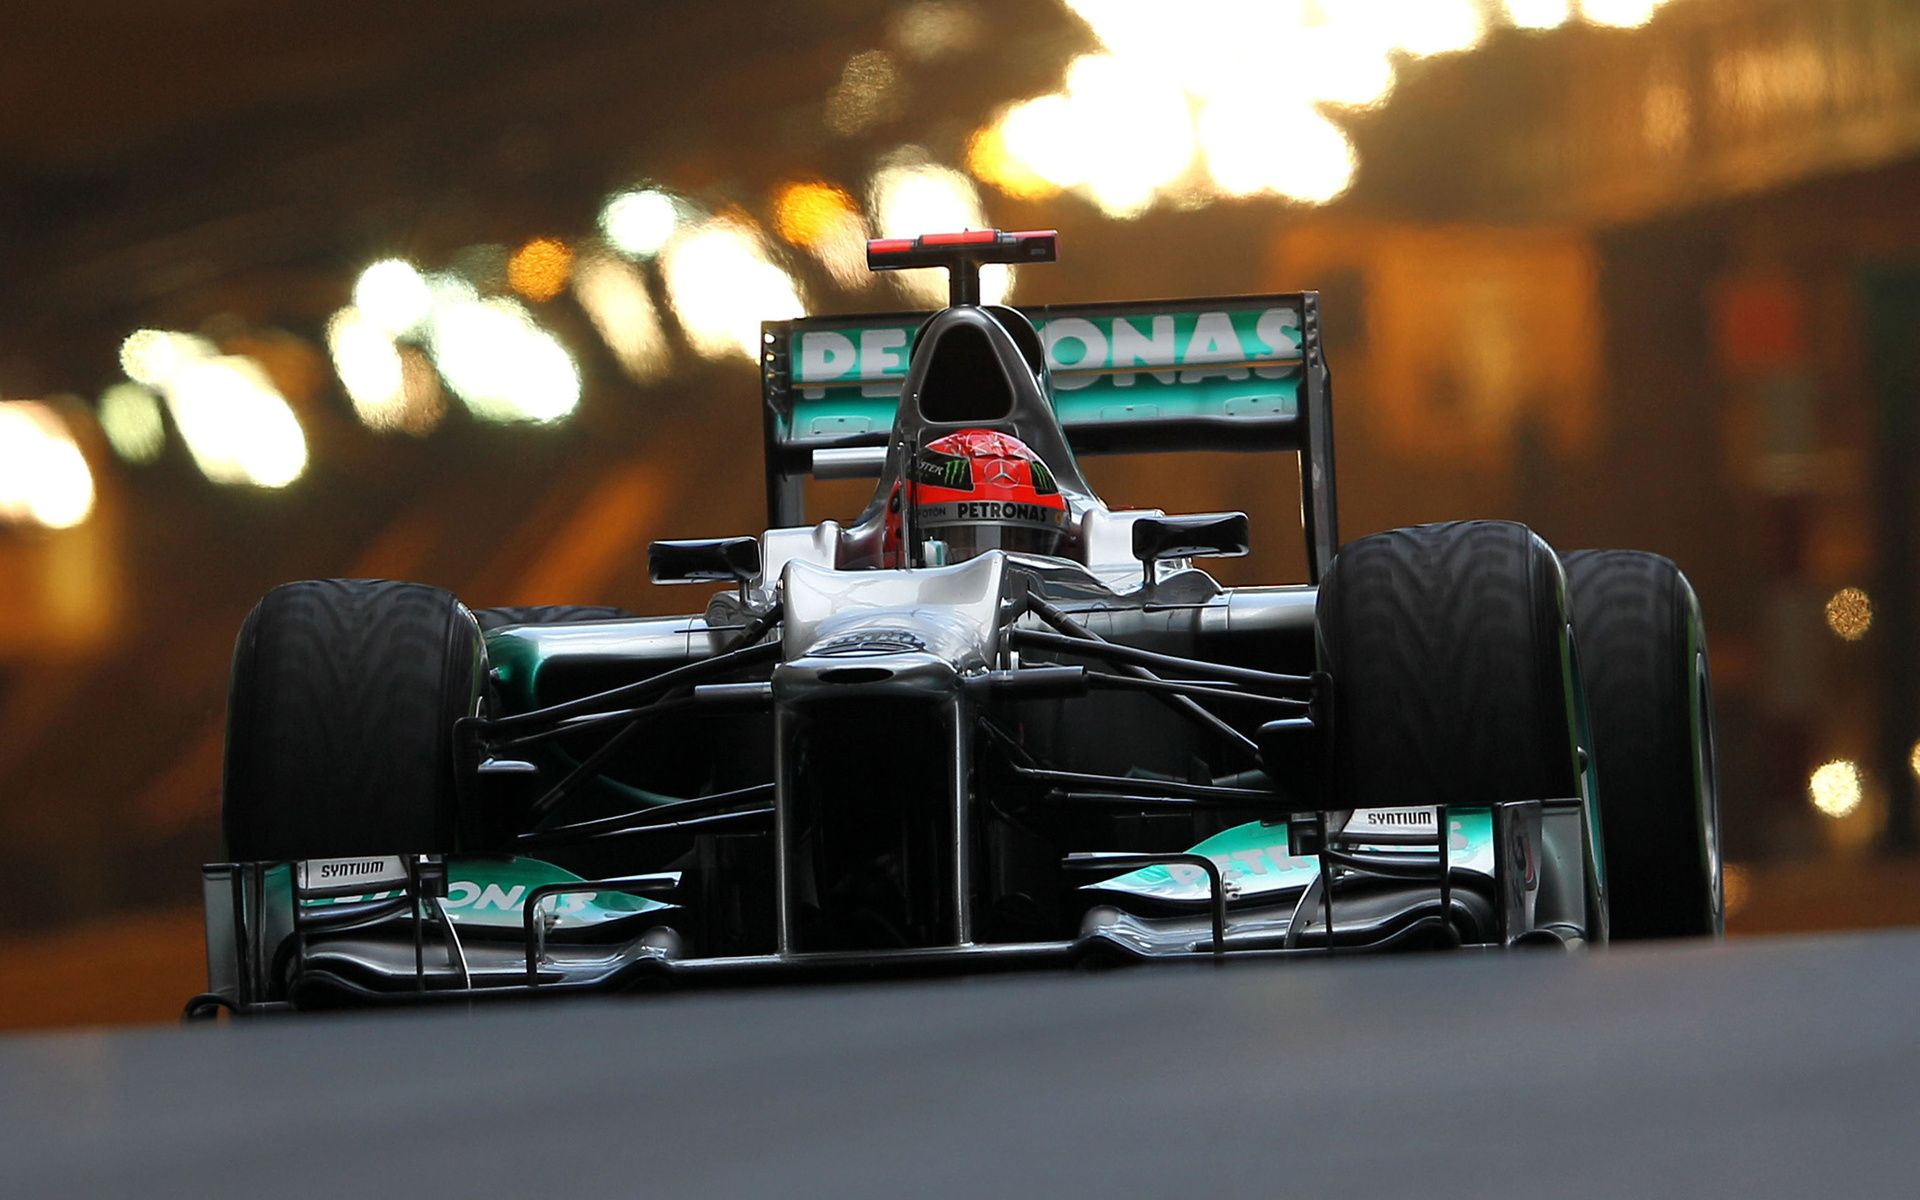 Michael Schumacher Michael Schumacher Schumacher Racing